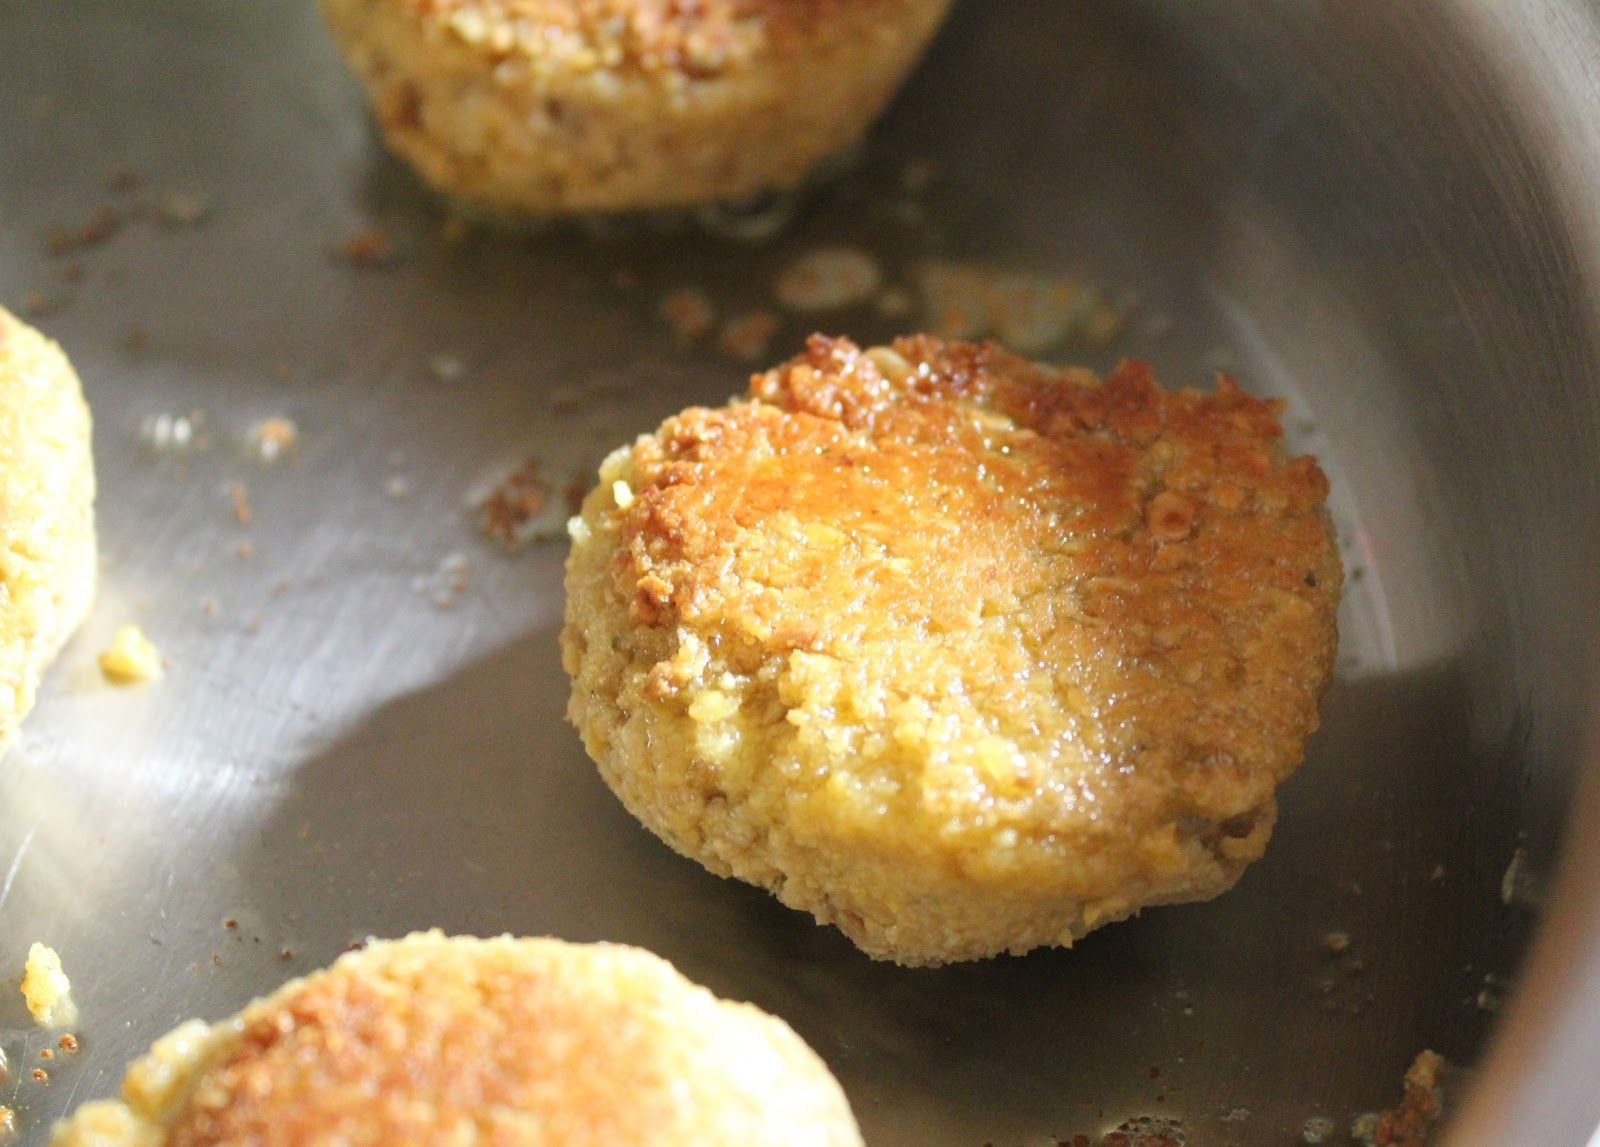 Sweet & Savory :: The Caramel Jar Blog: Recipes :: Chickpea Burgers